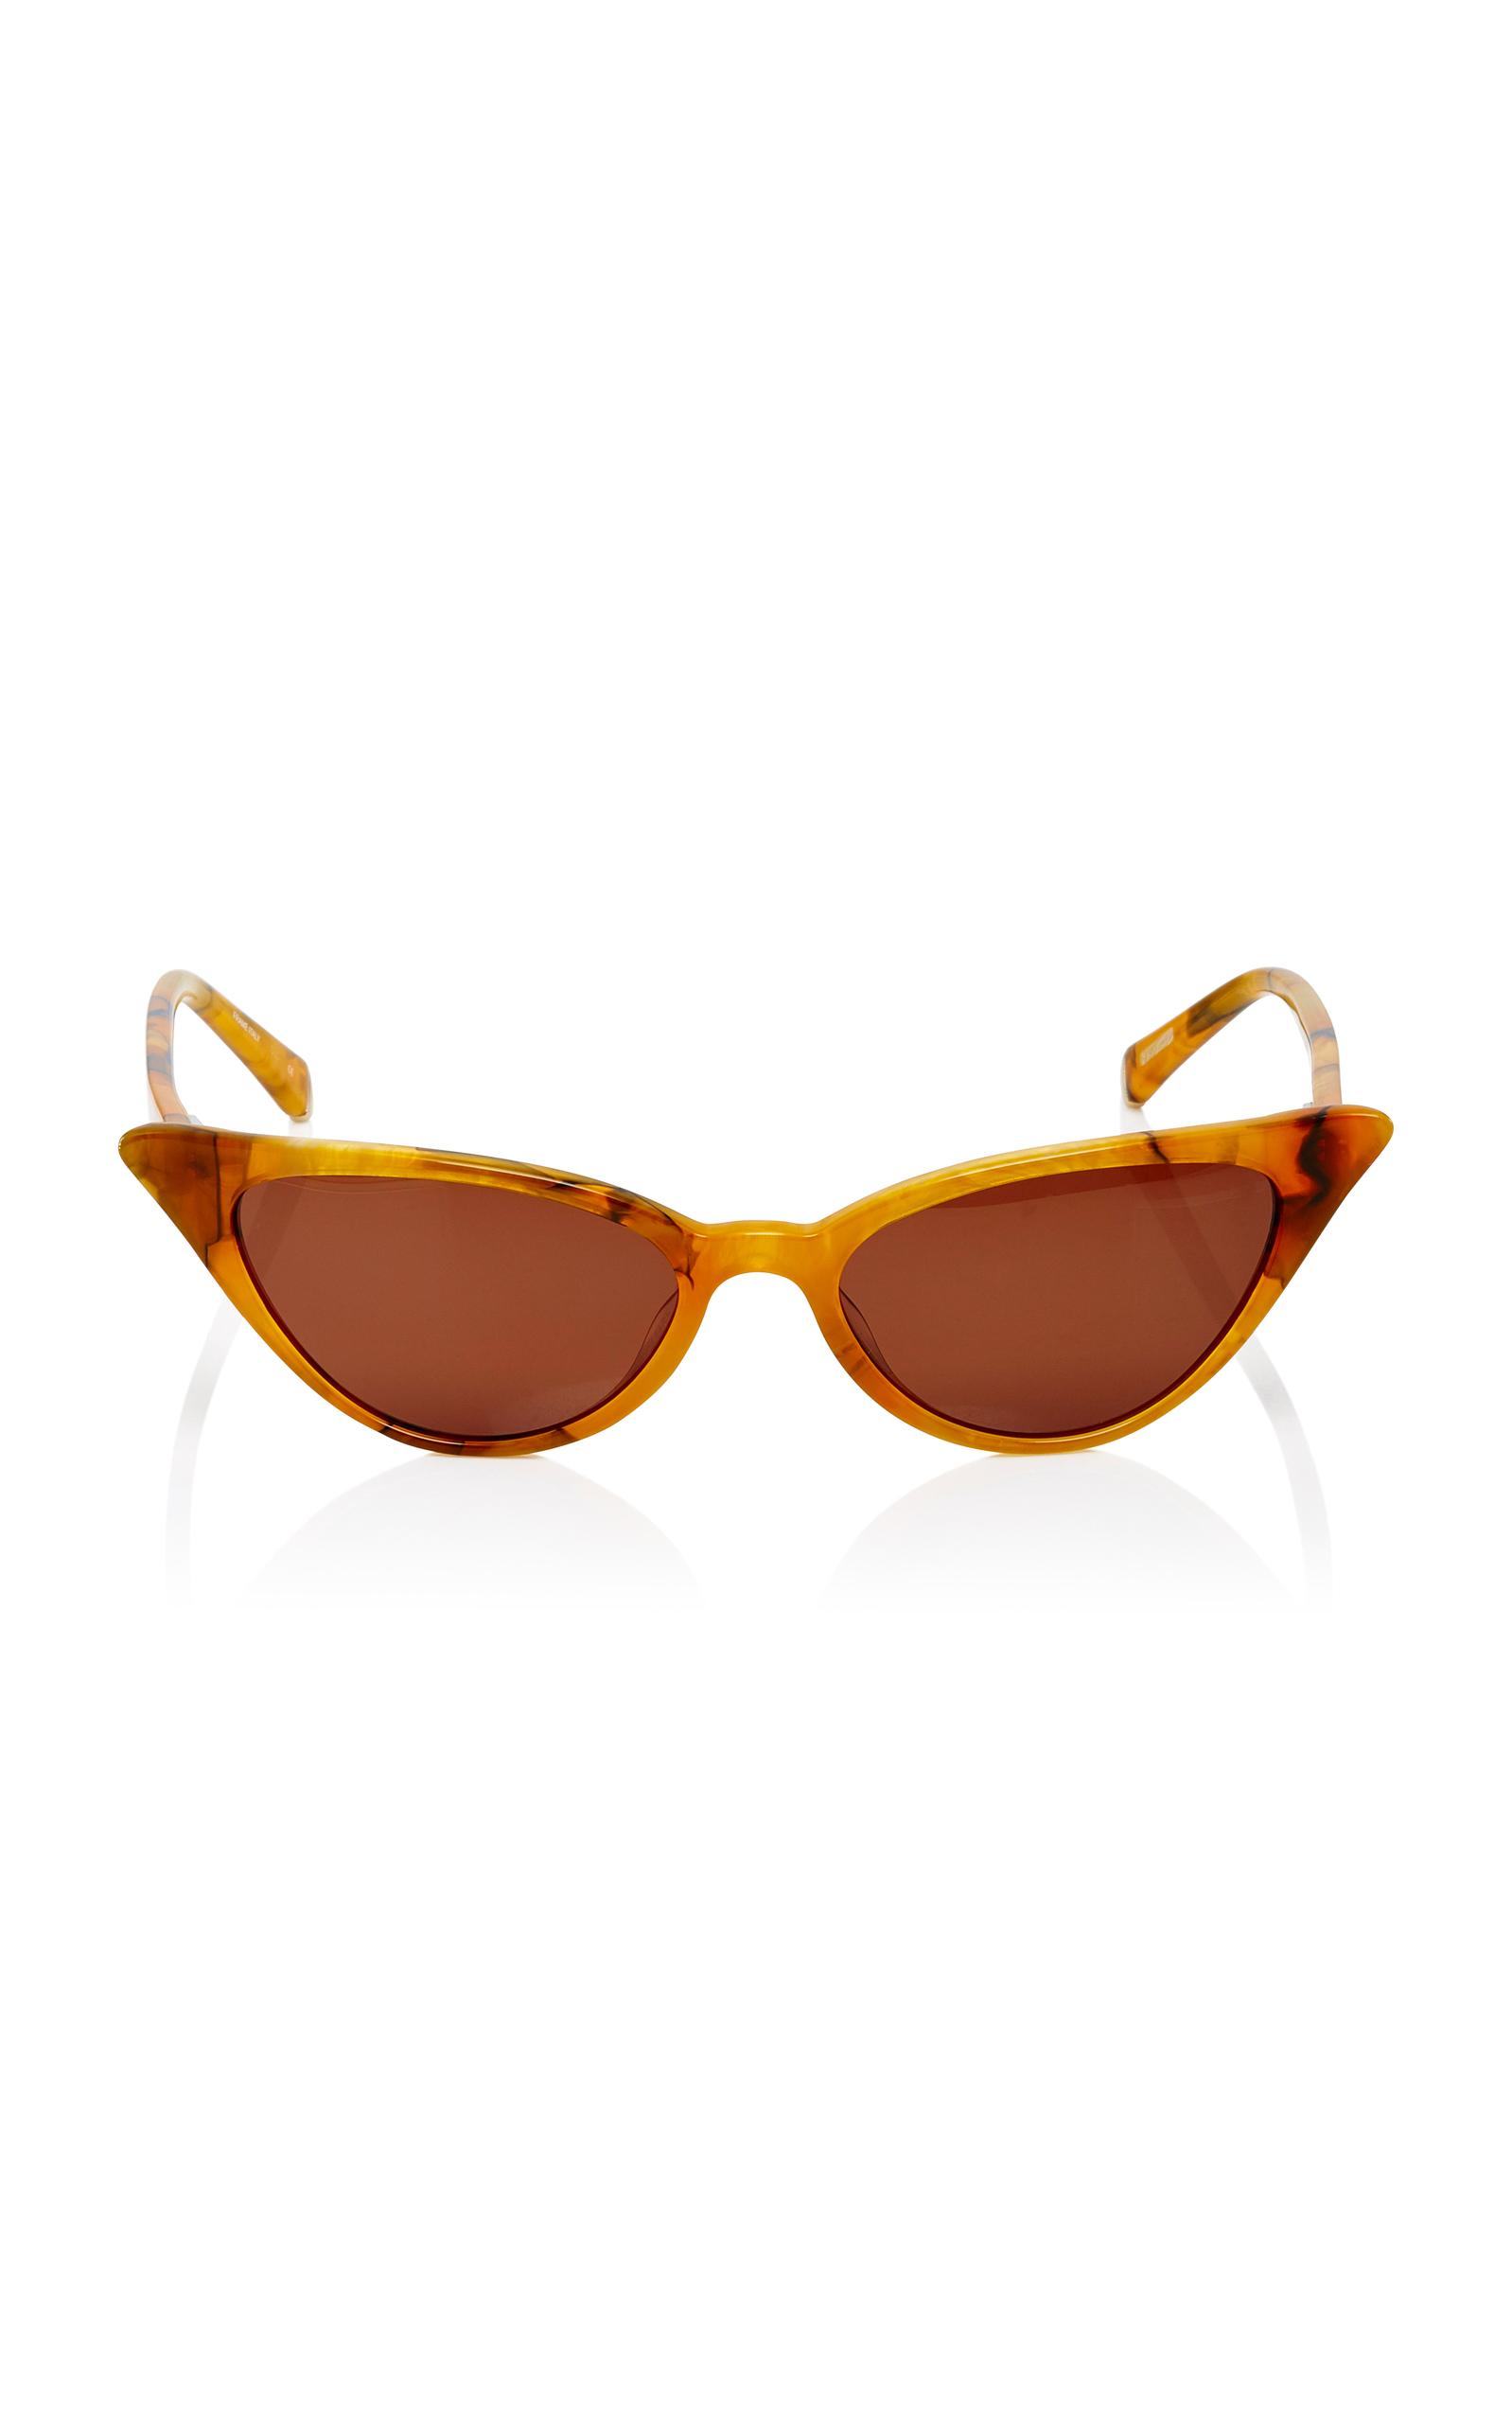 KATE YOUNG Lita Cat-Eye Sunglasses in Yellow